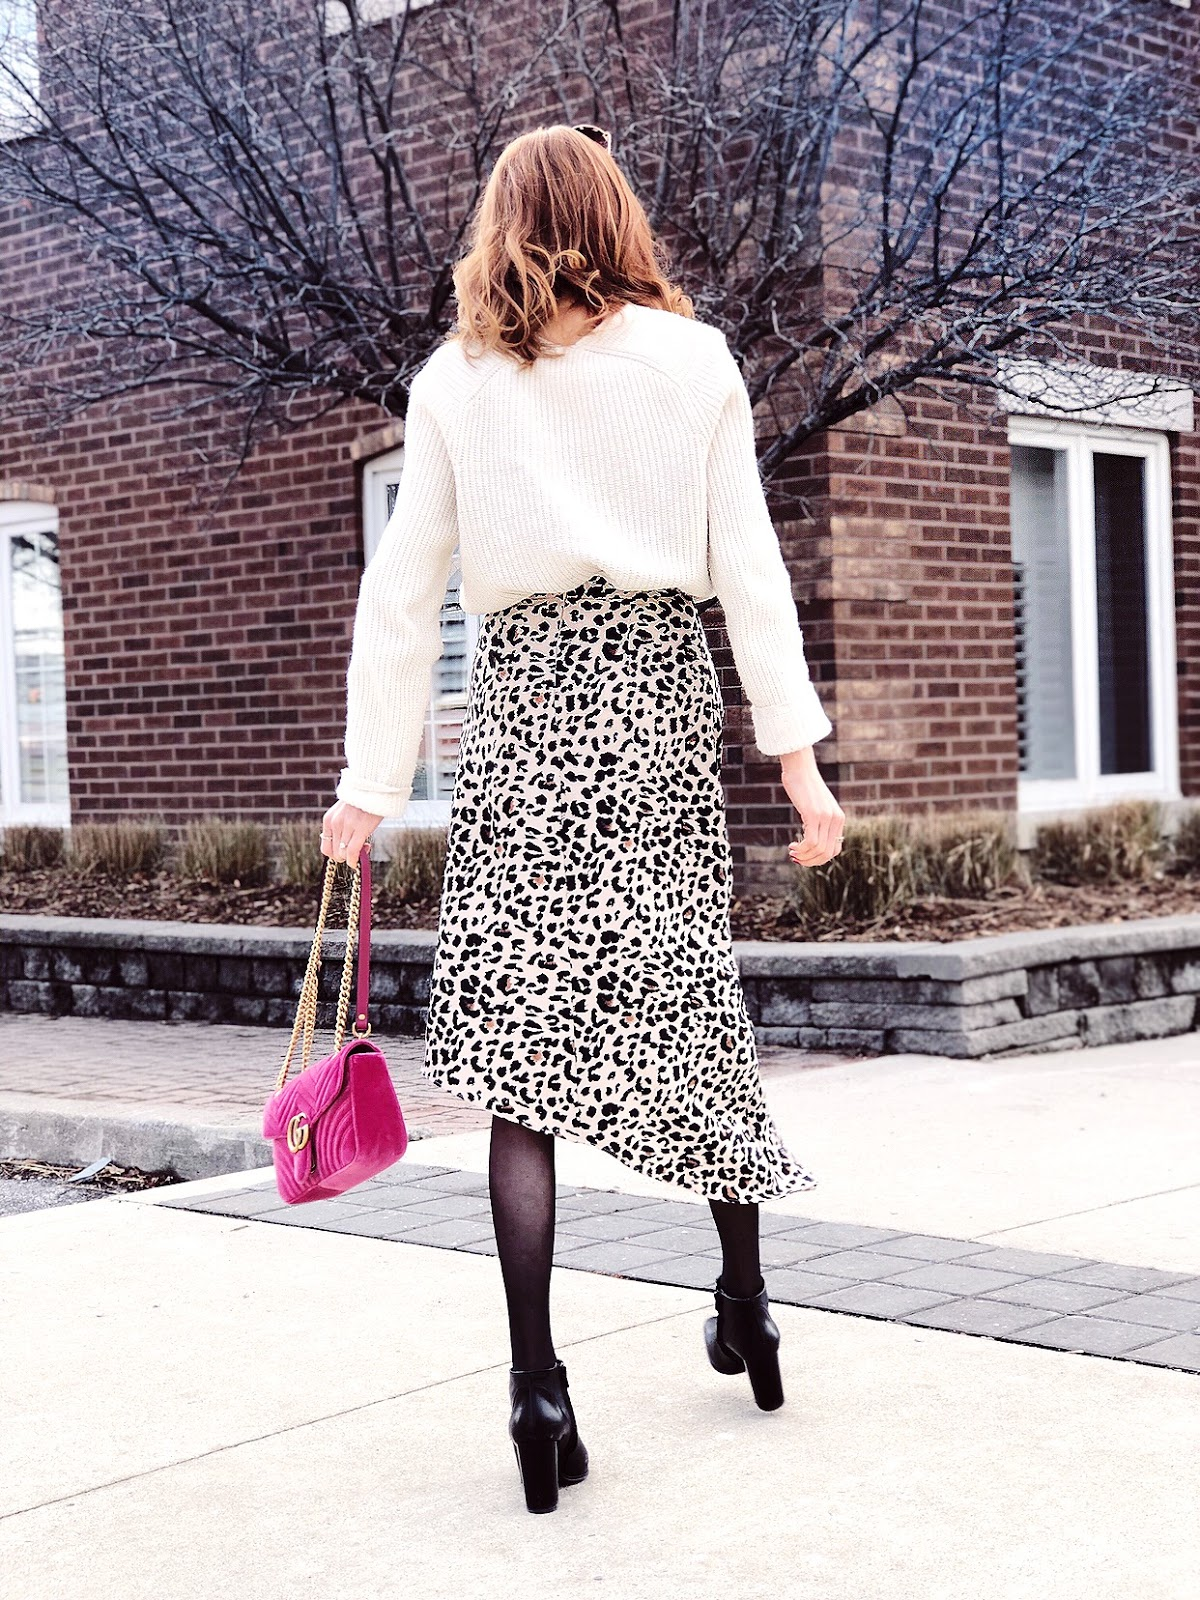 Dynamite Asymmetrical Satin Leopard Skirt, Gucci velvet pink marmont